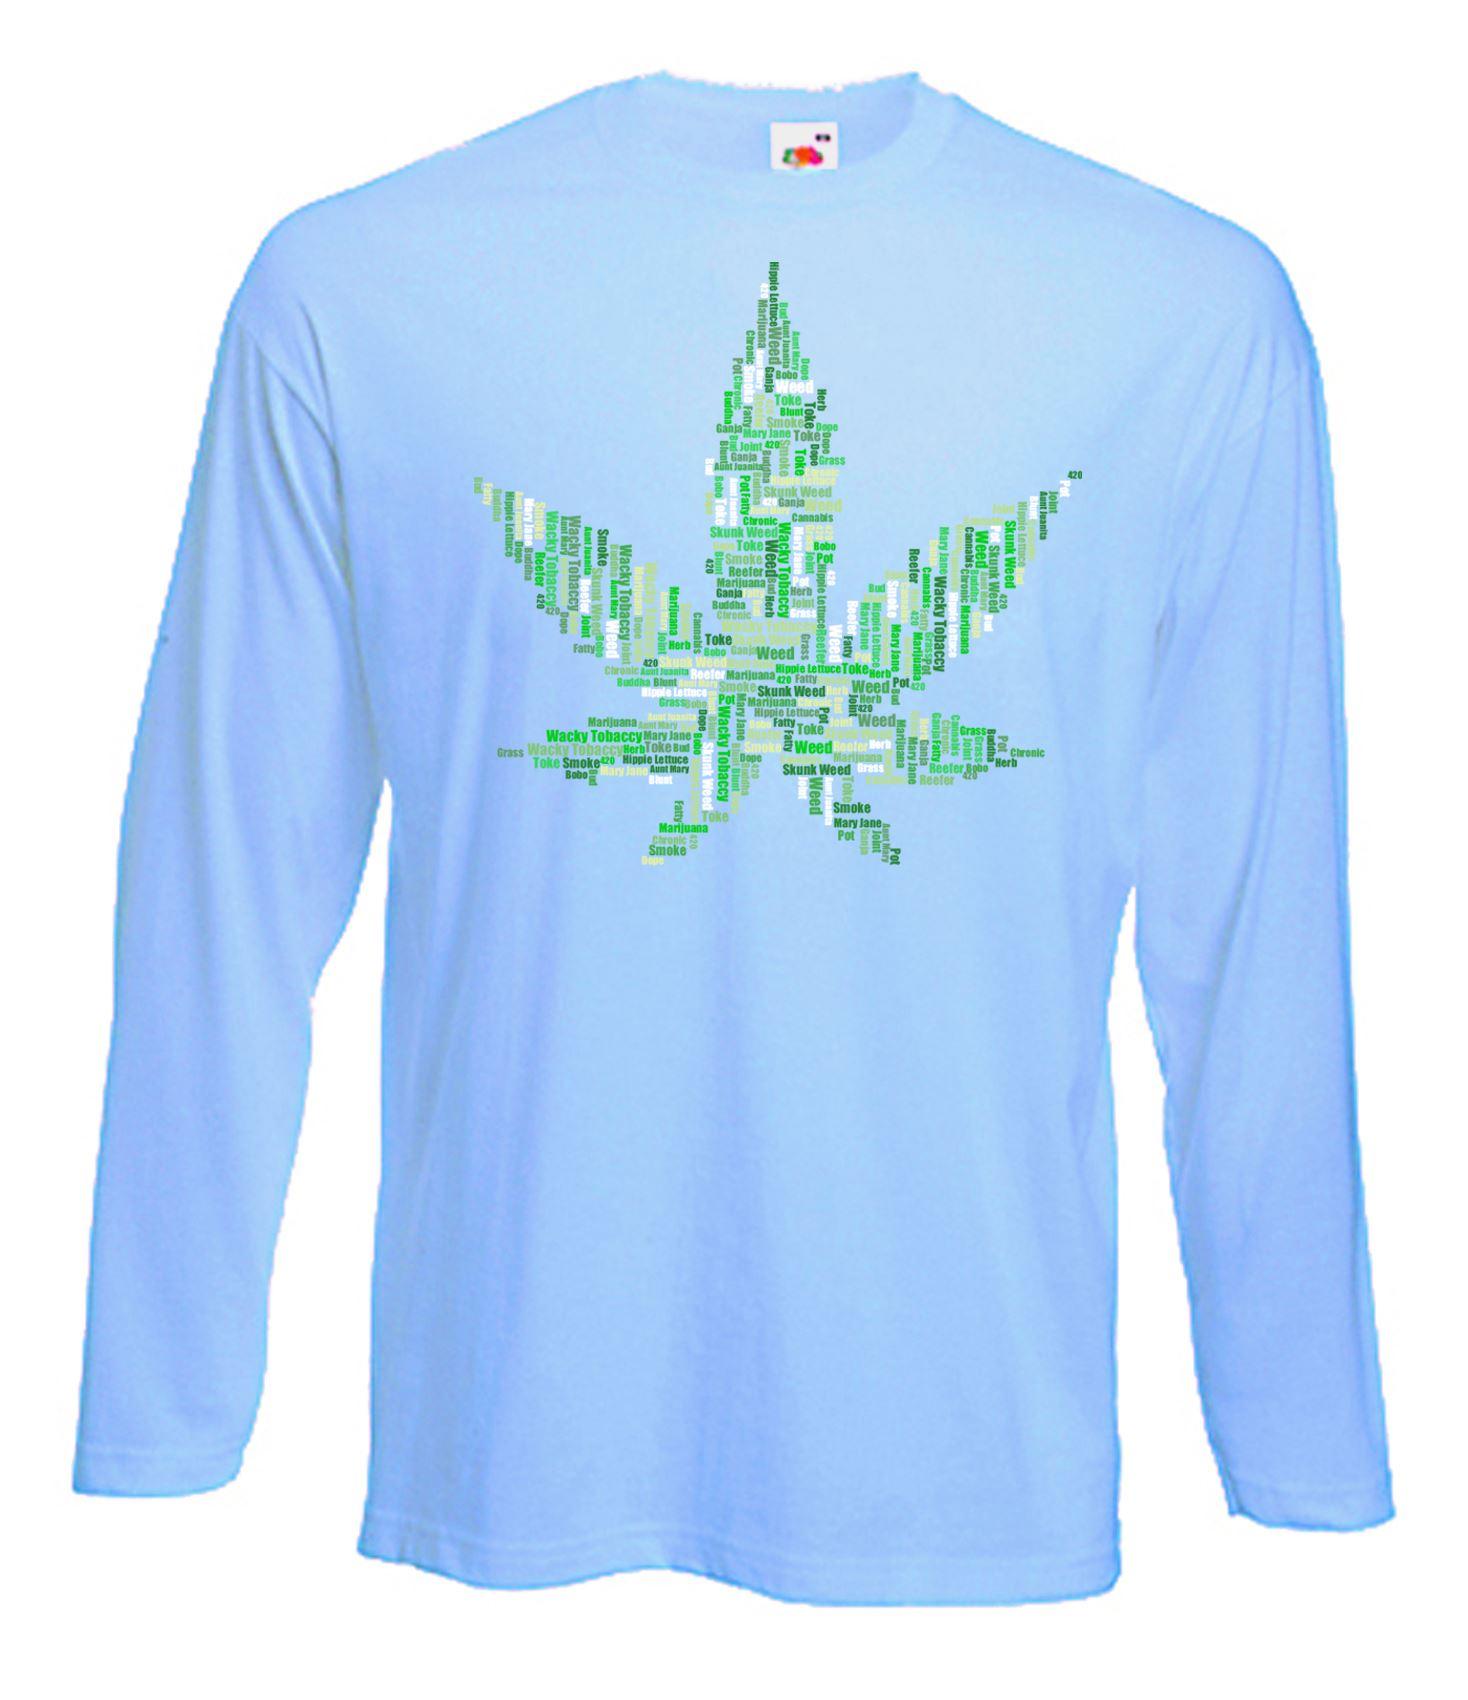 Cannabis Slang Names Funny Long Sleeve T-Shirt | eBay